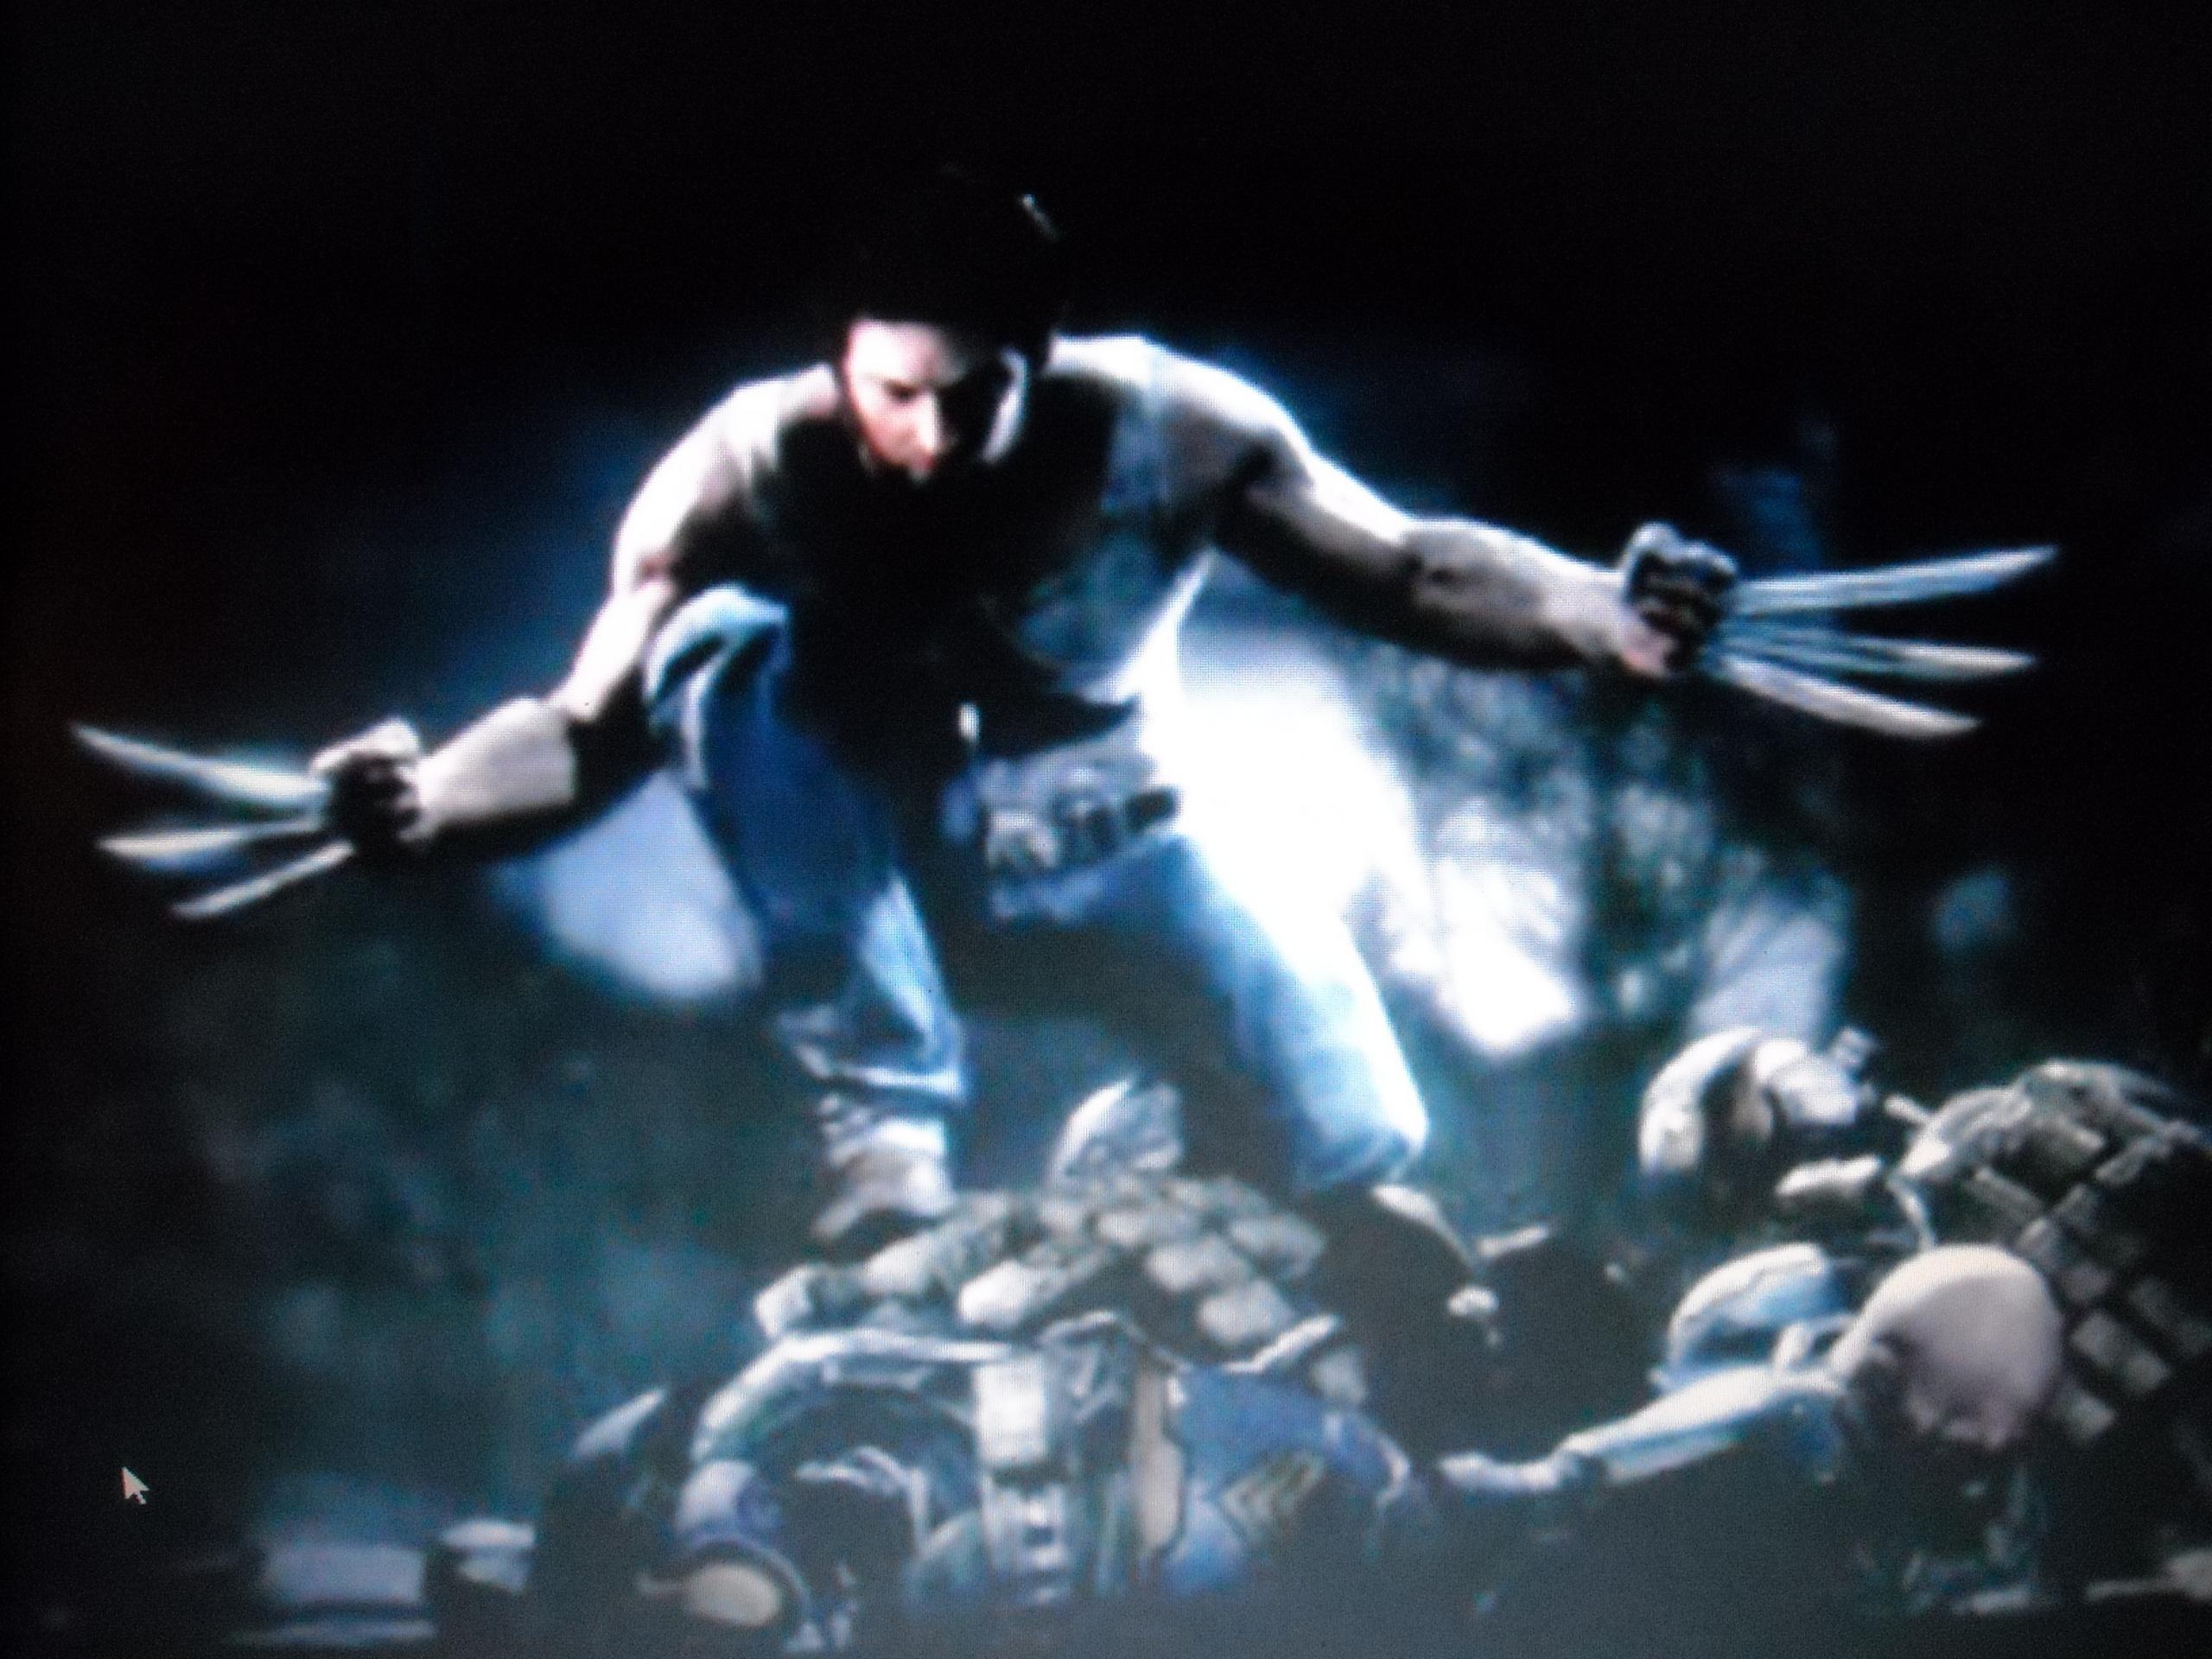 Games Wallpapers HD X Men Origins Wolverine Game 2560x1920